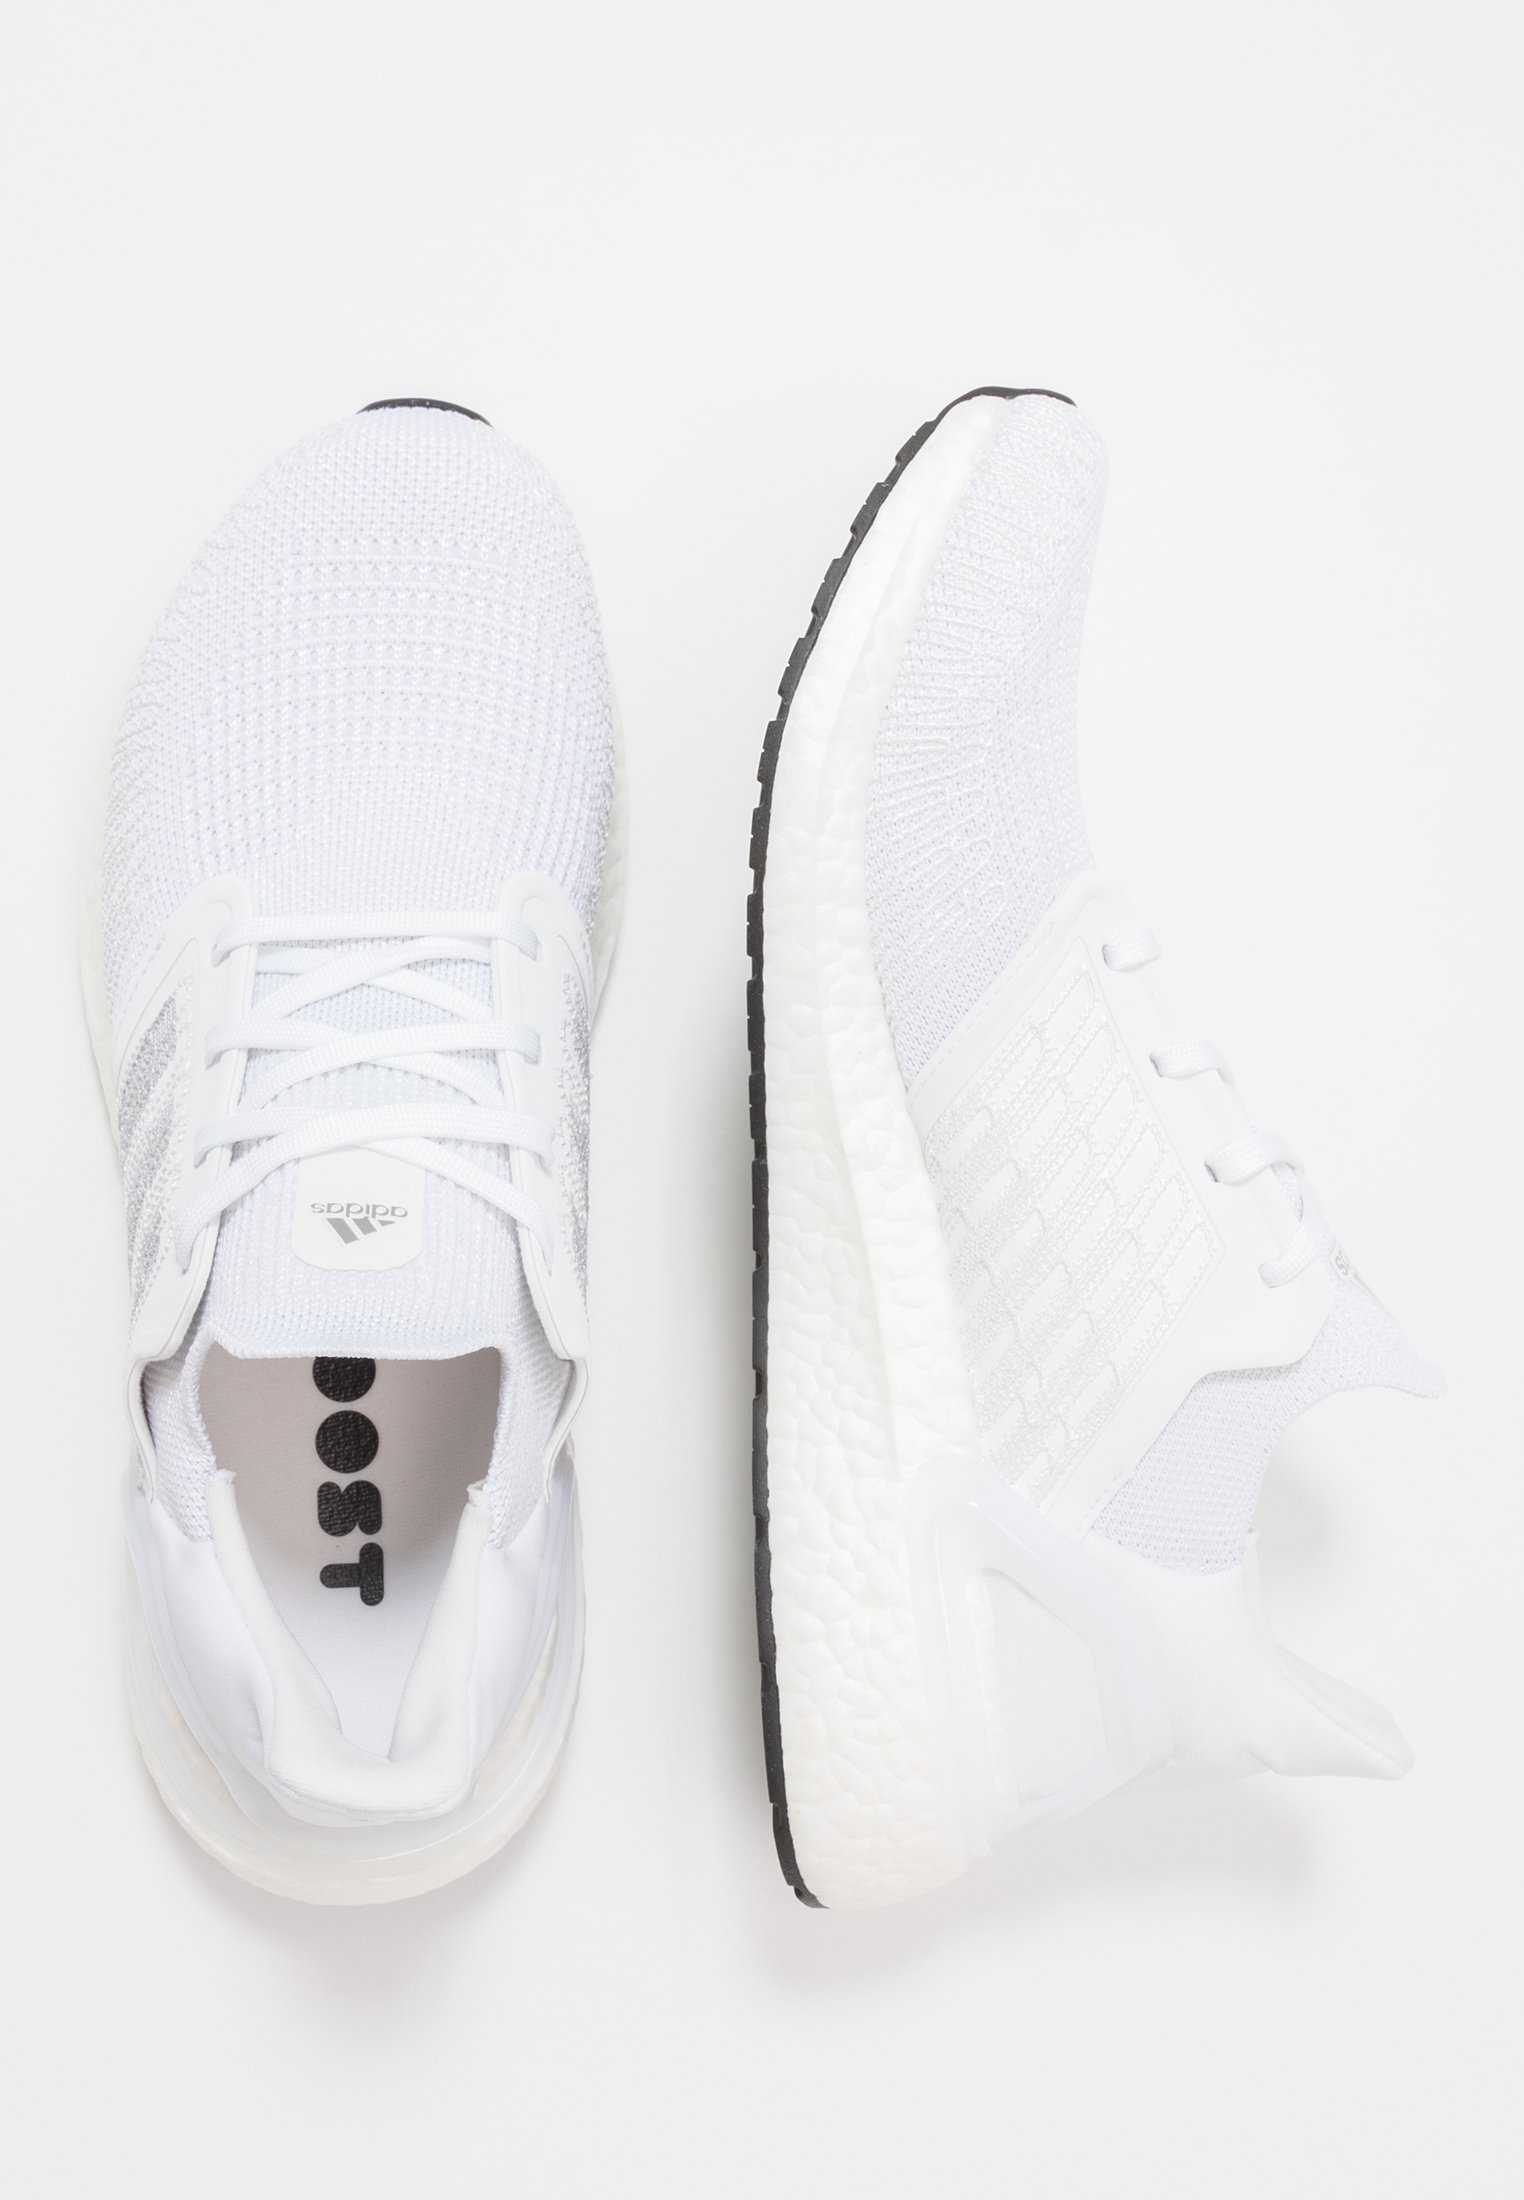 ULTRABOOST 20 PRIMEKNIT RUNNING SHOES Laufschuh Neutral footwear whitecore black